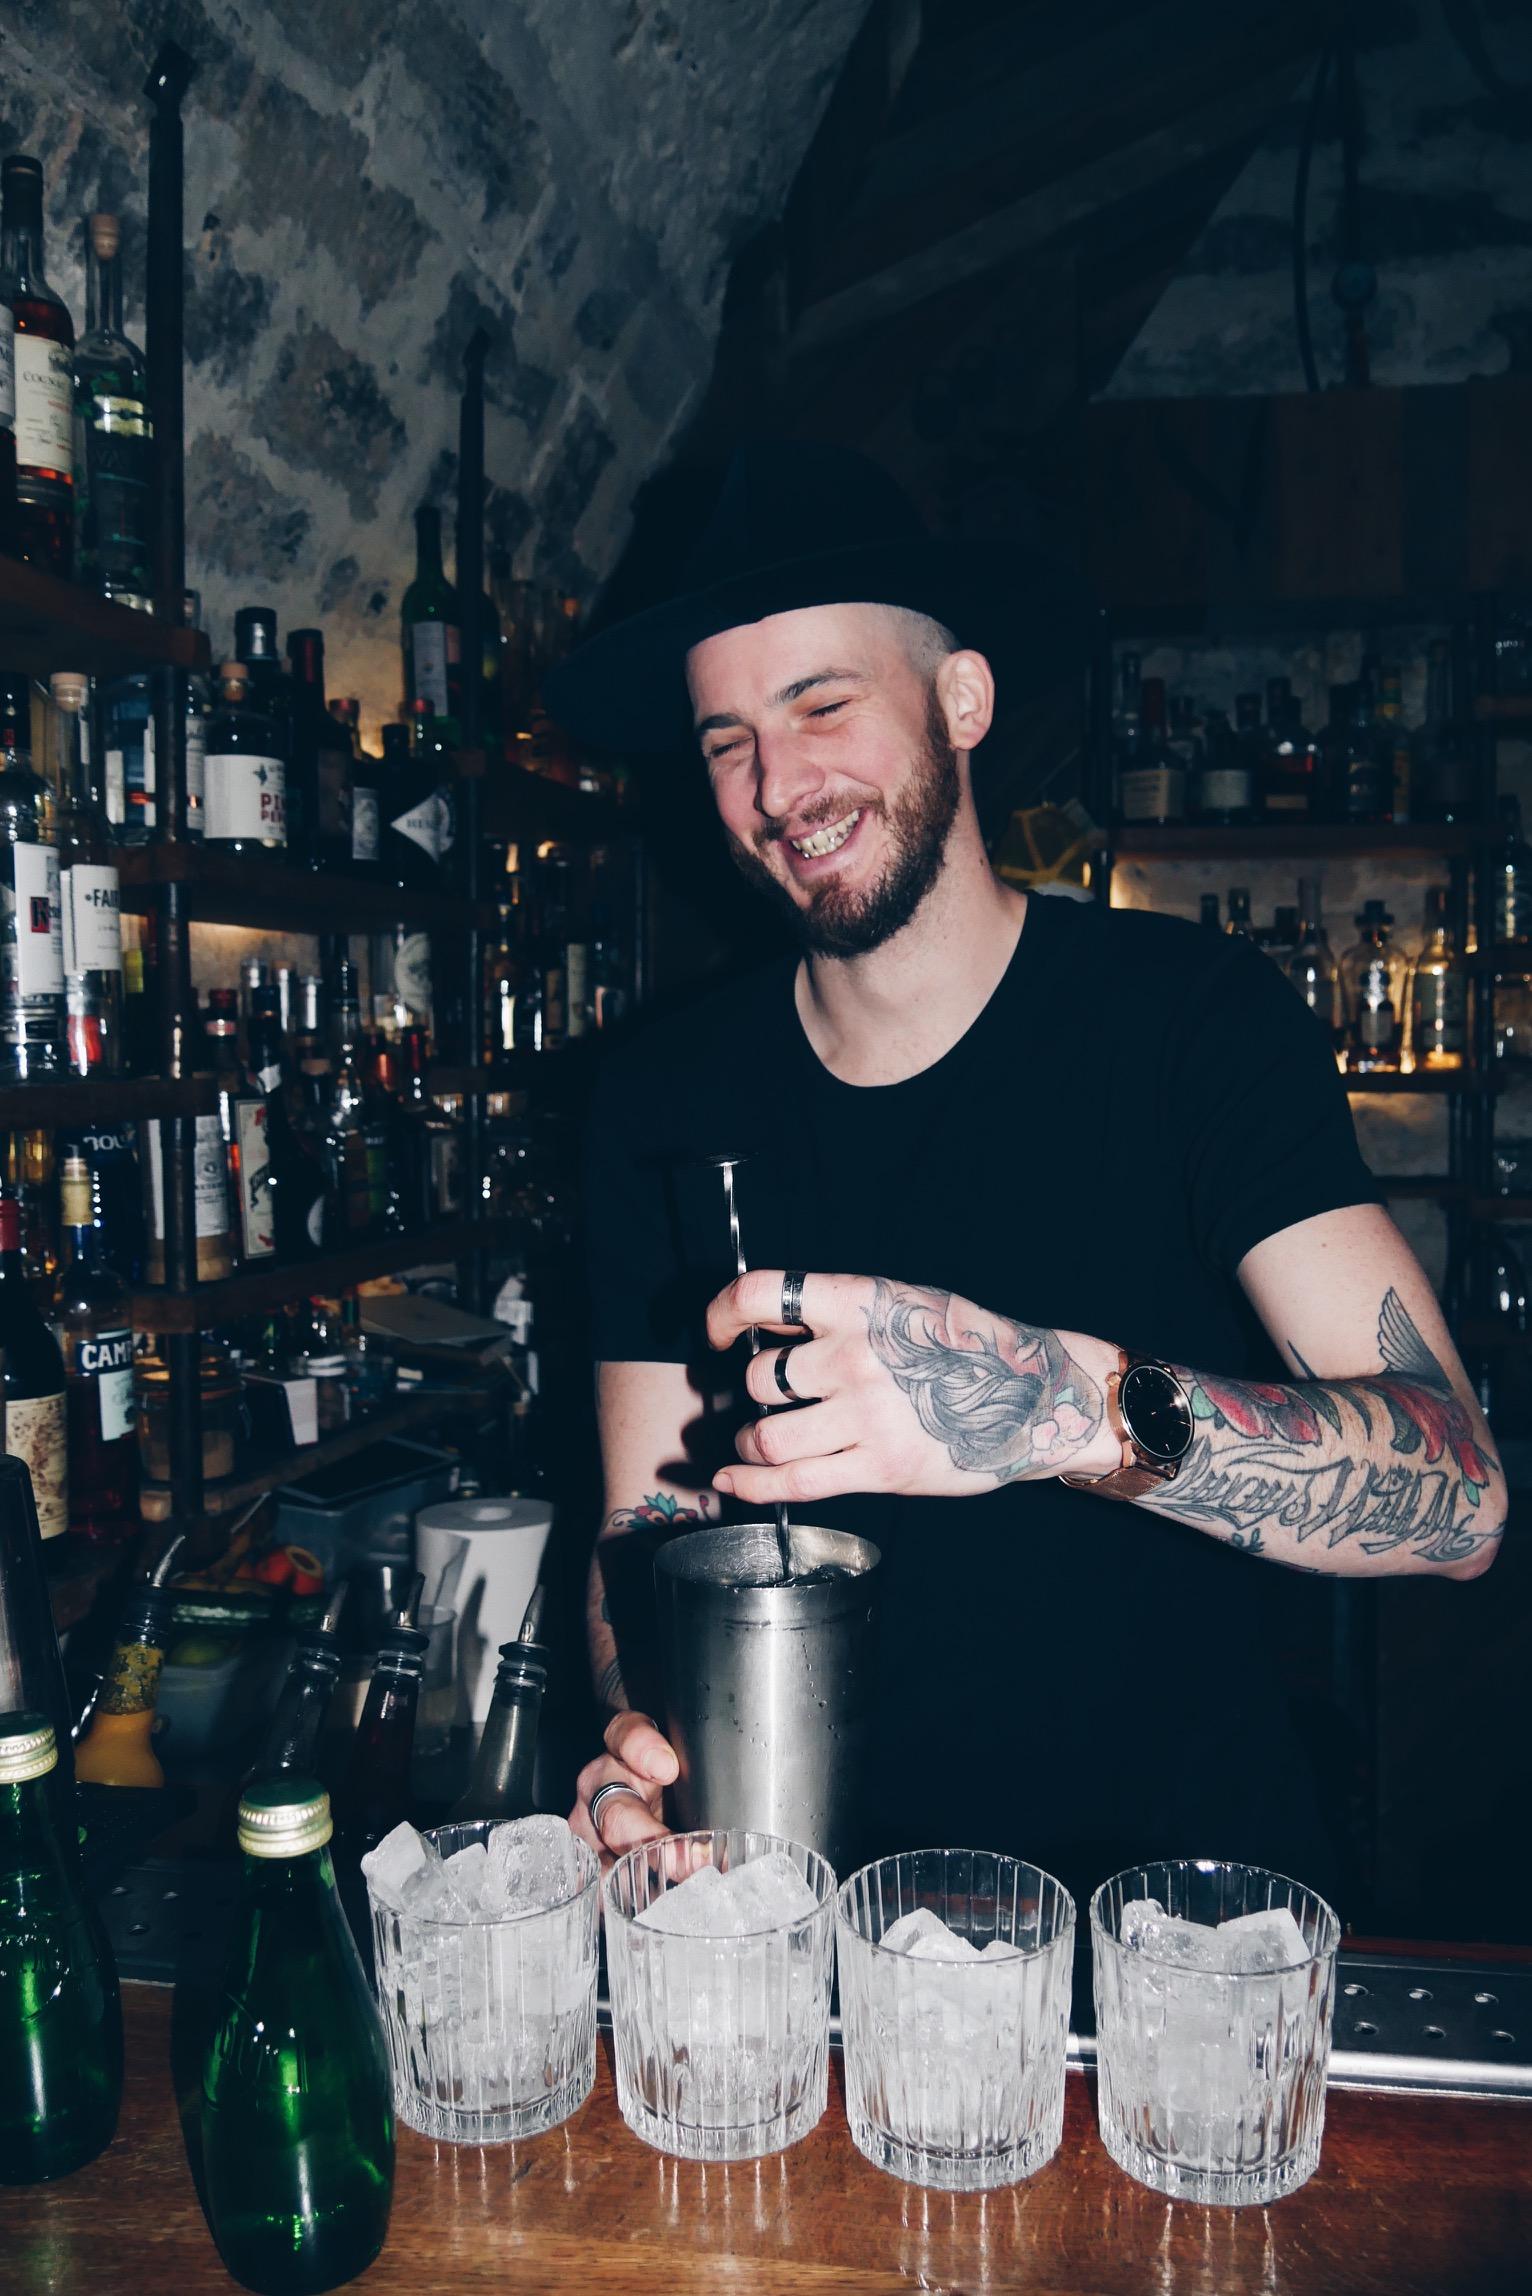 Bar-Lockwood-Paris-Mathieu-barman-charming-man-paris-cocktail-week-photo-usofparis